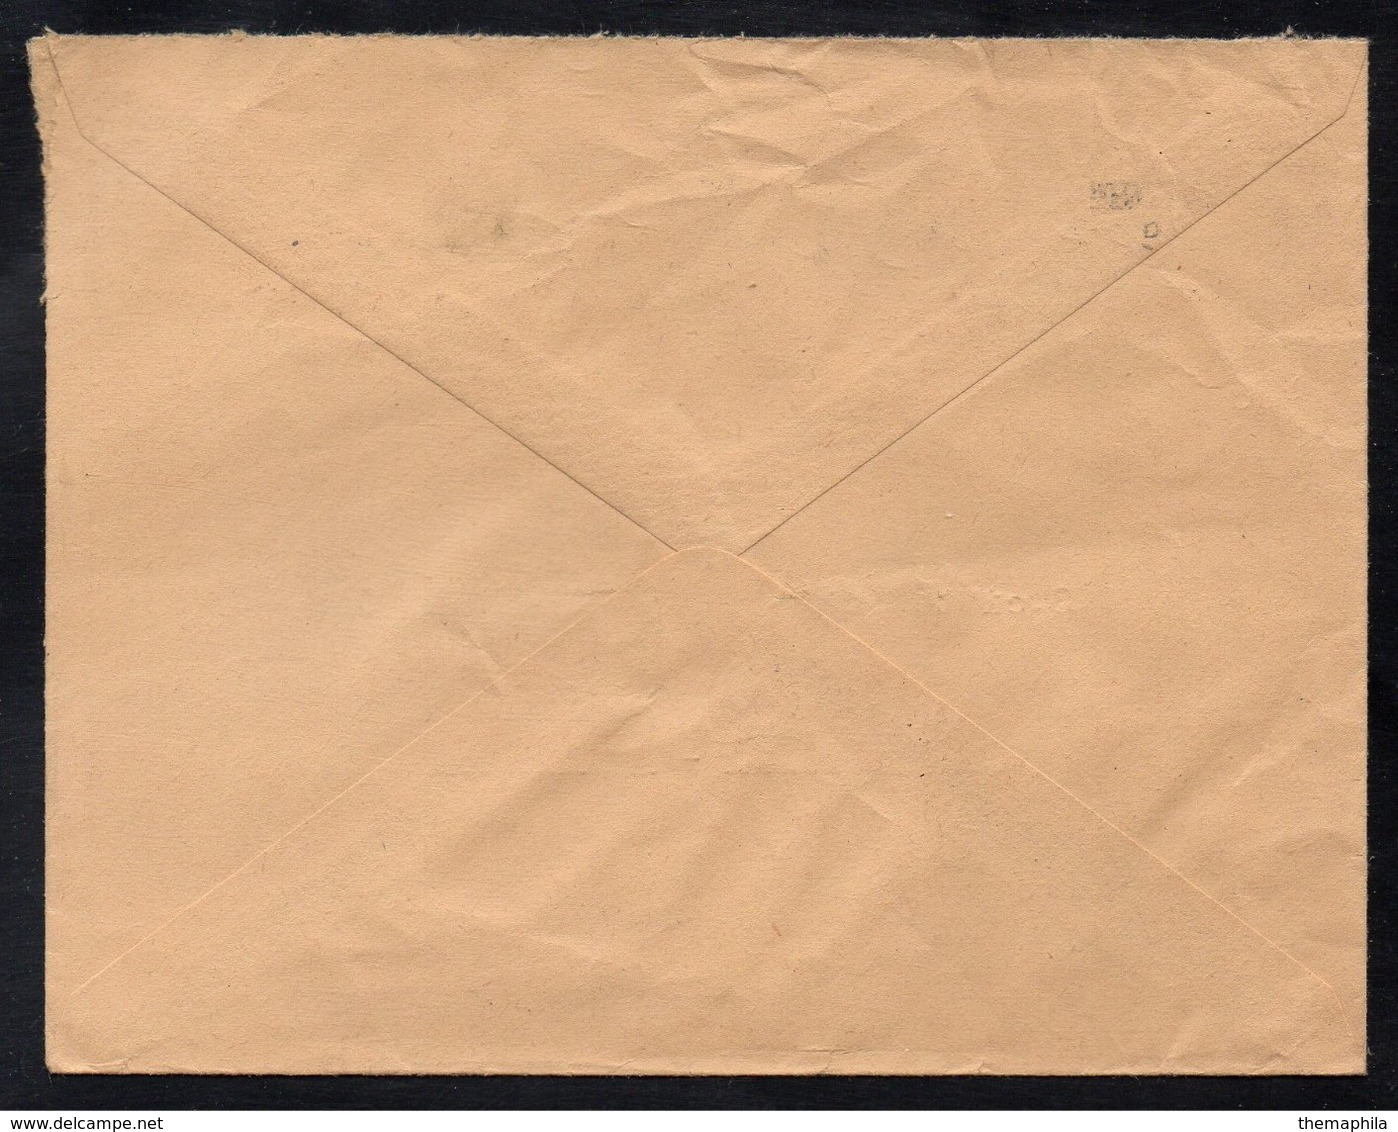 VOLCAN - VULKAN - VOLCANO / 1956 ST PIERRE MARTINIQUE OBLITERATION RBV SUR LETTRE (ref 7641a) - Volcans